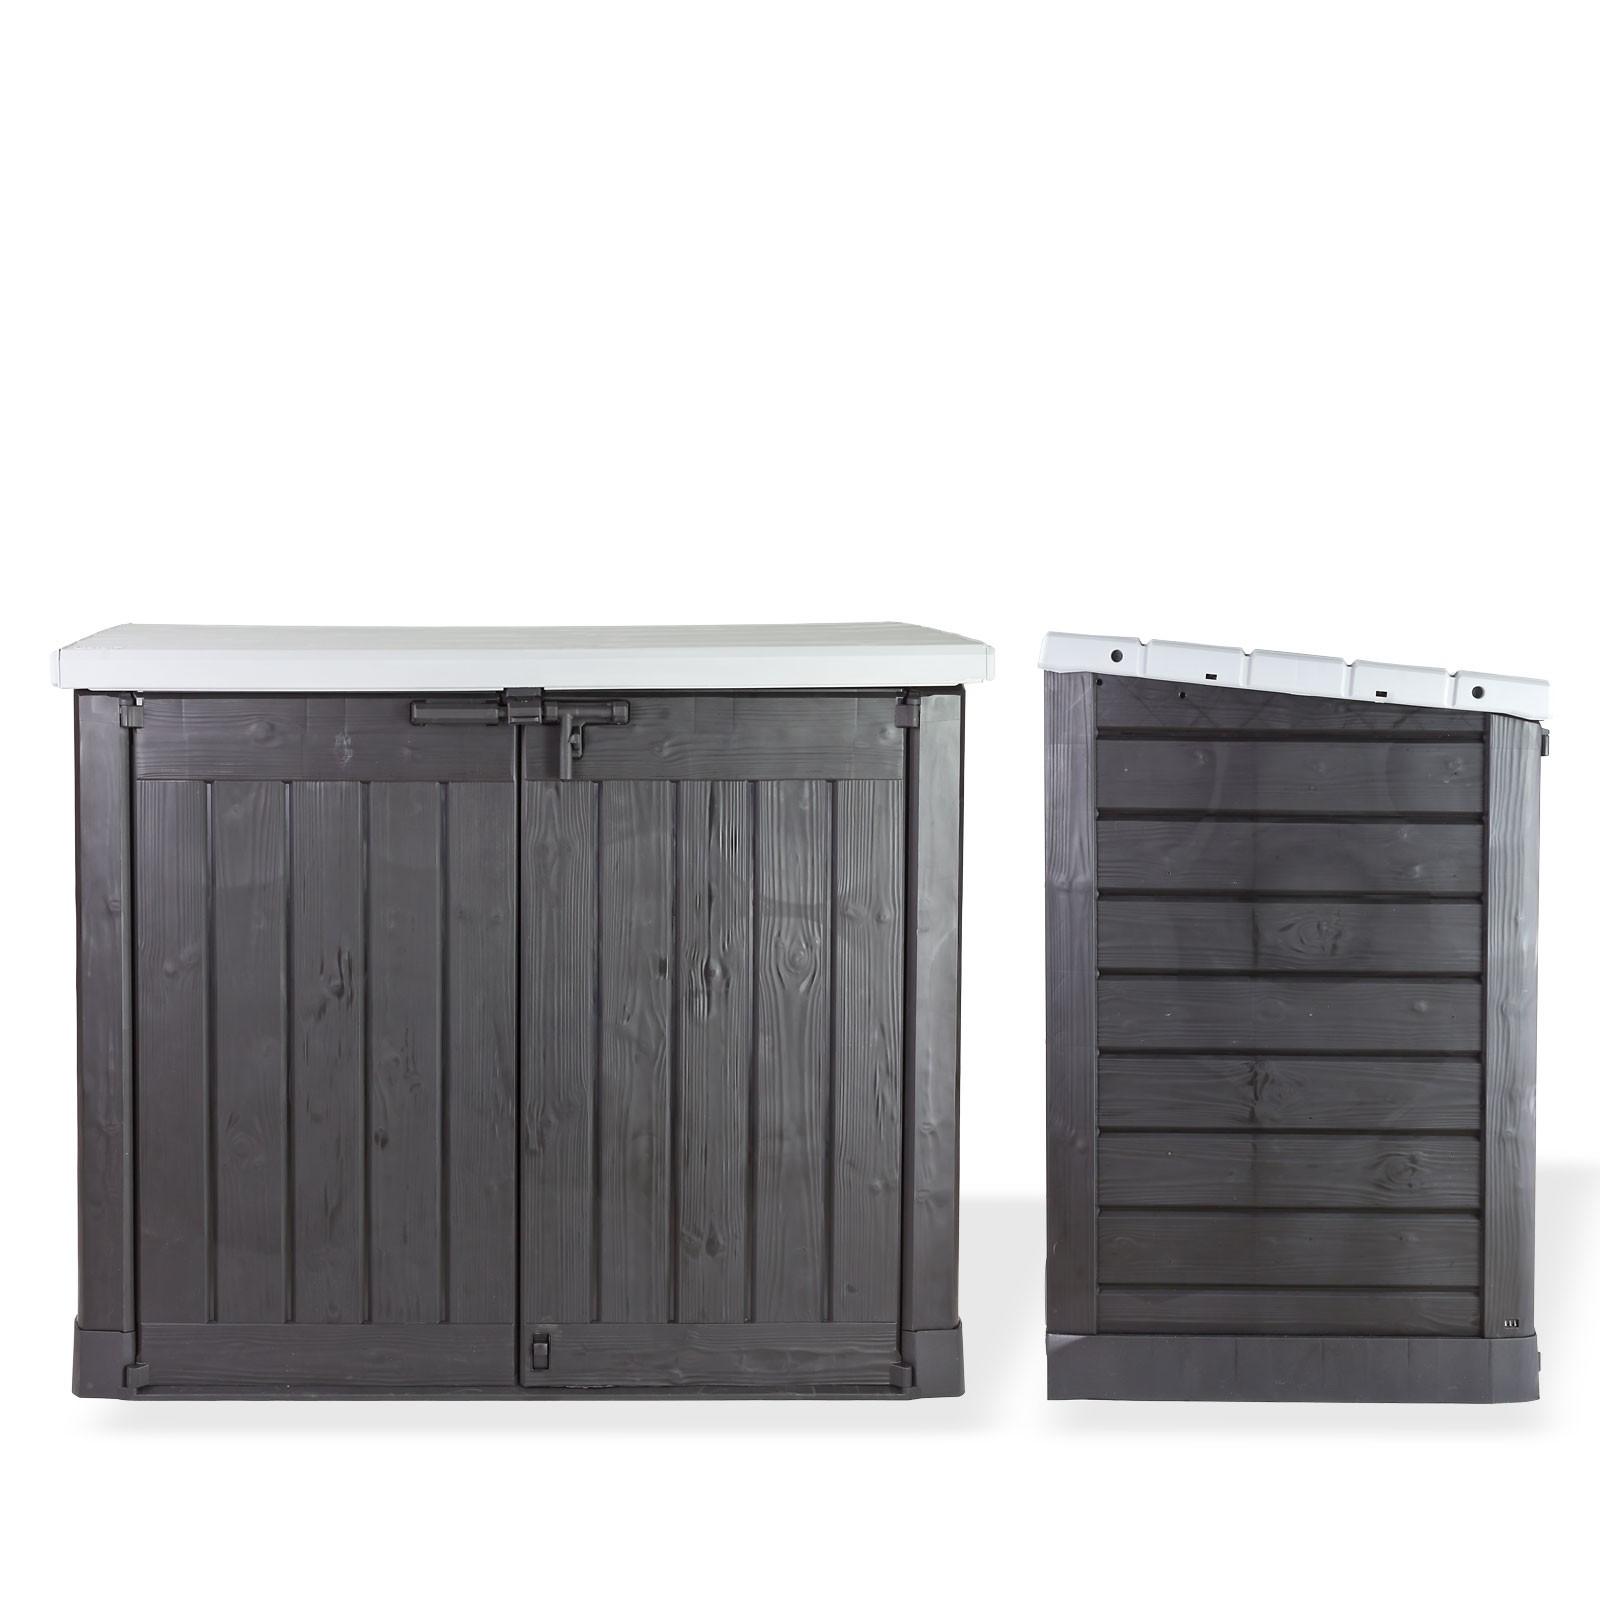 xl m lltonnenbox aufbewahrungsbox f r 2x 240 liter beh lter. Black Bedroom Furniture Sets. Home Design Ideas